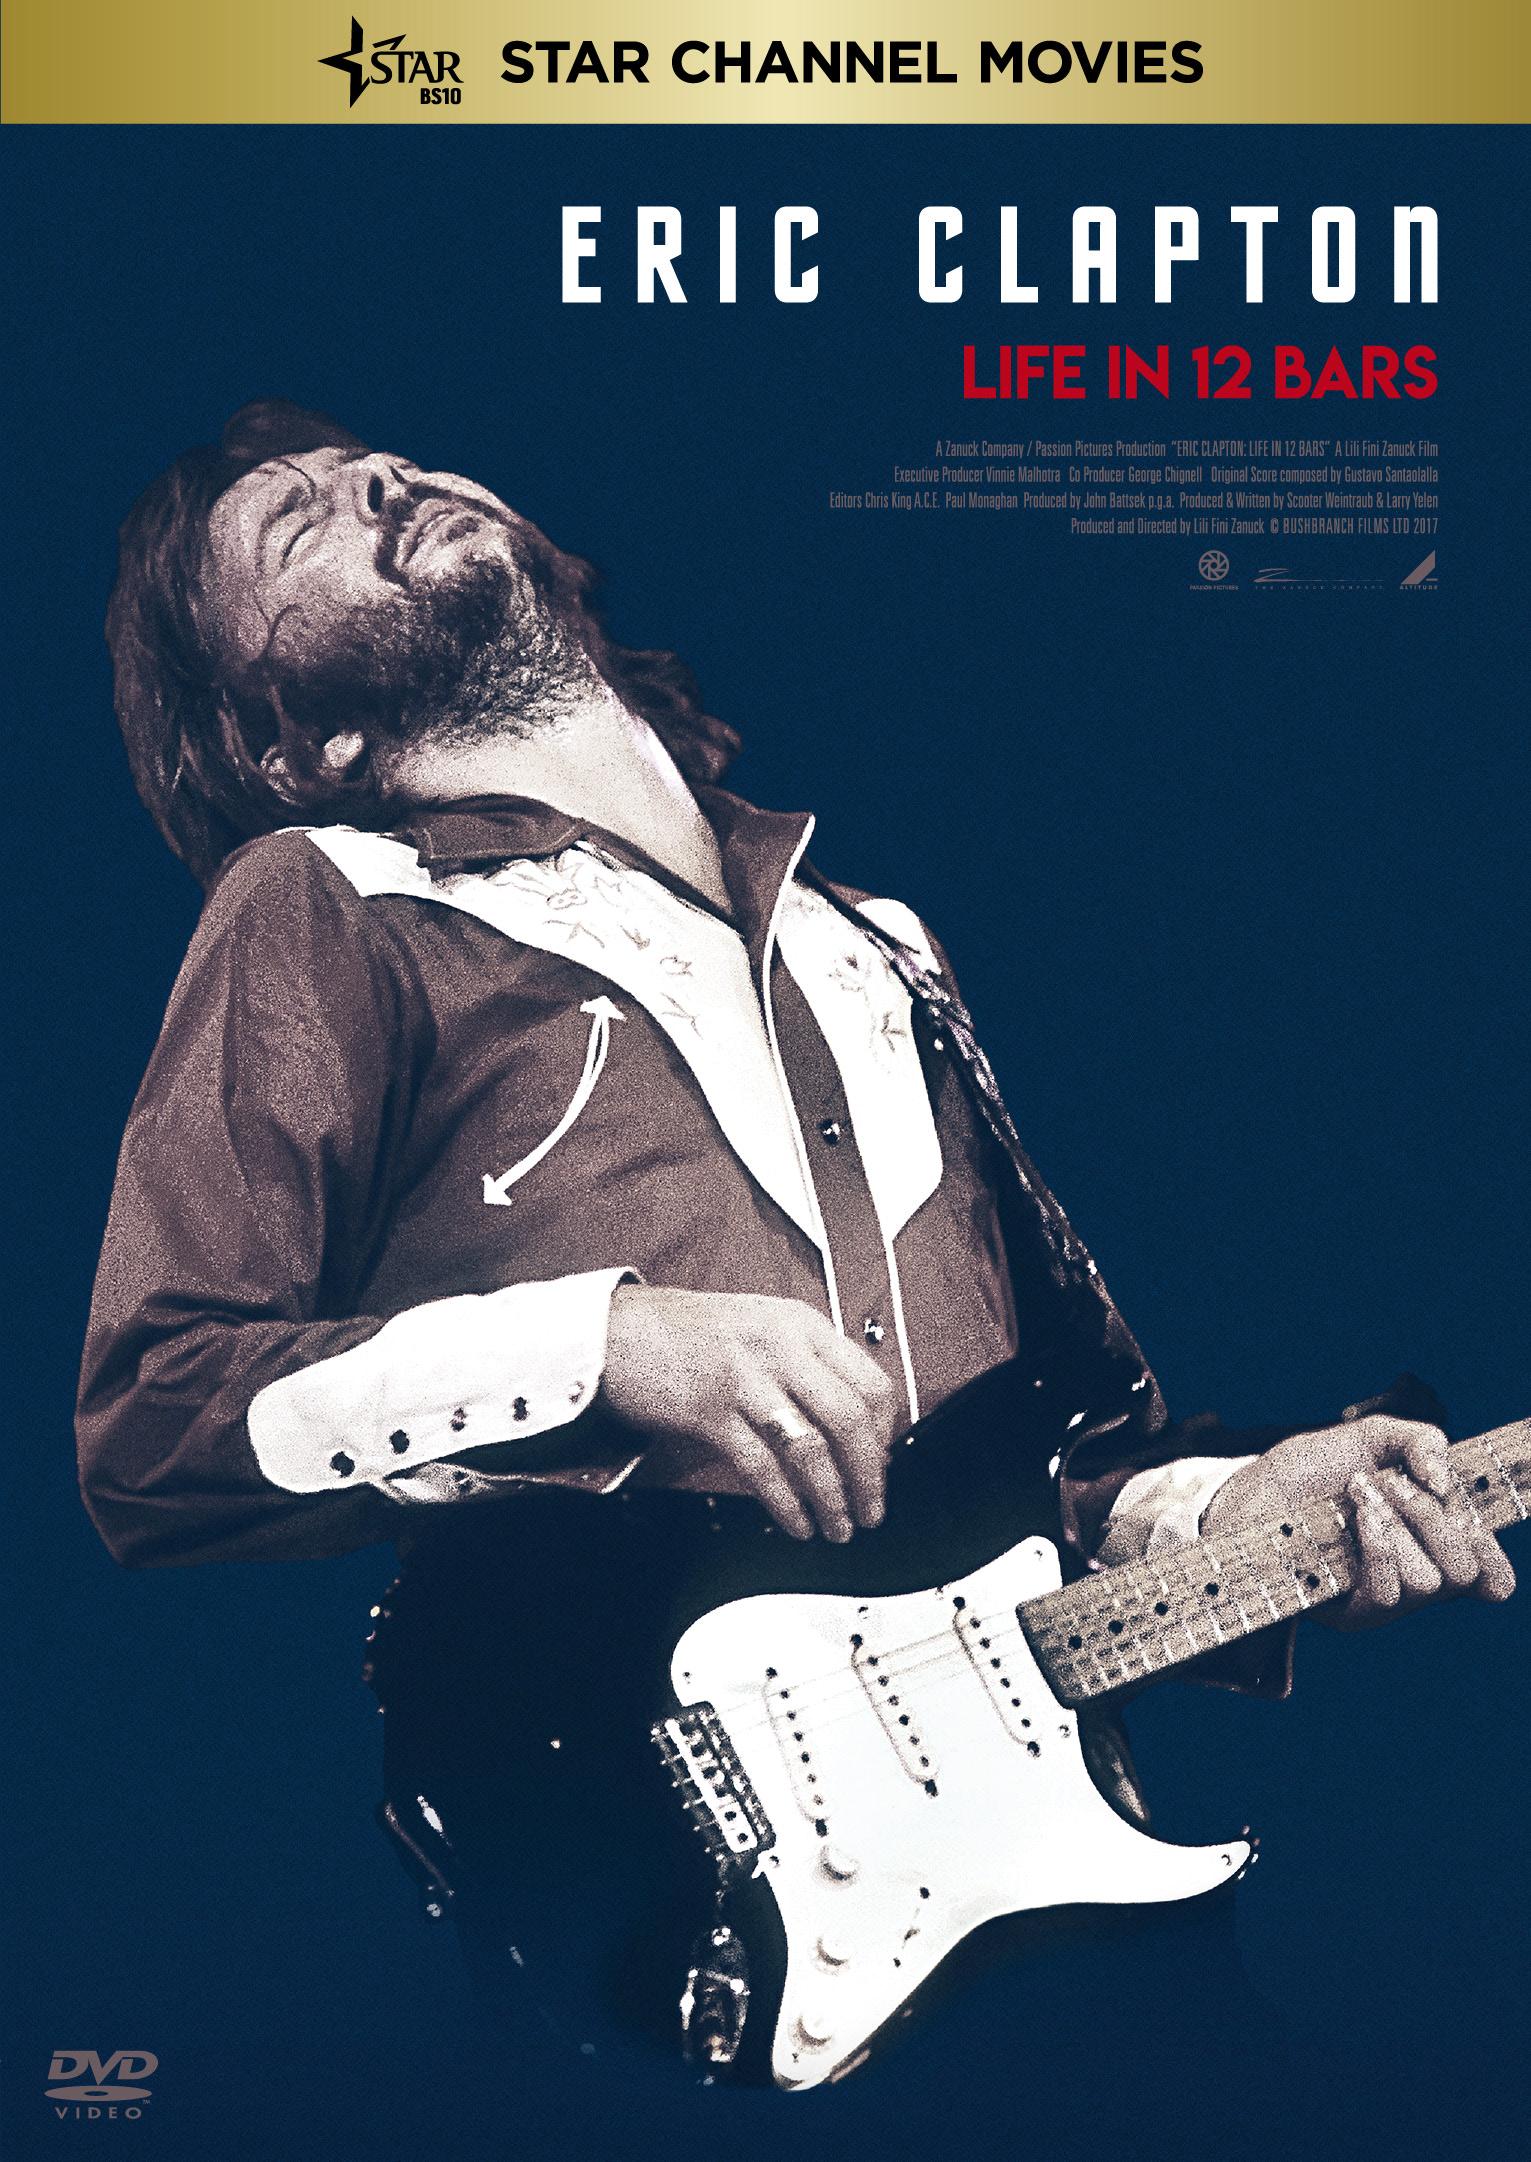 DVD_Clapton.jpg